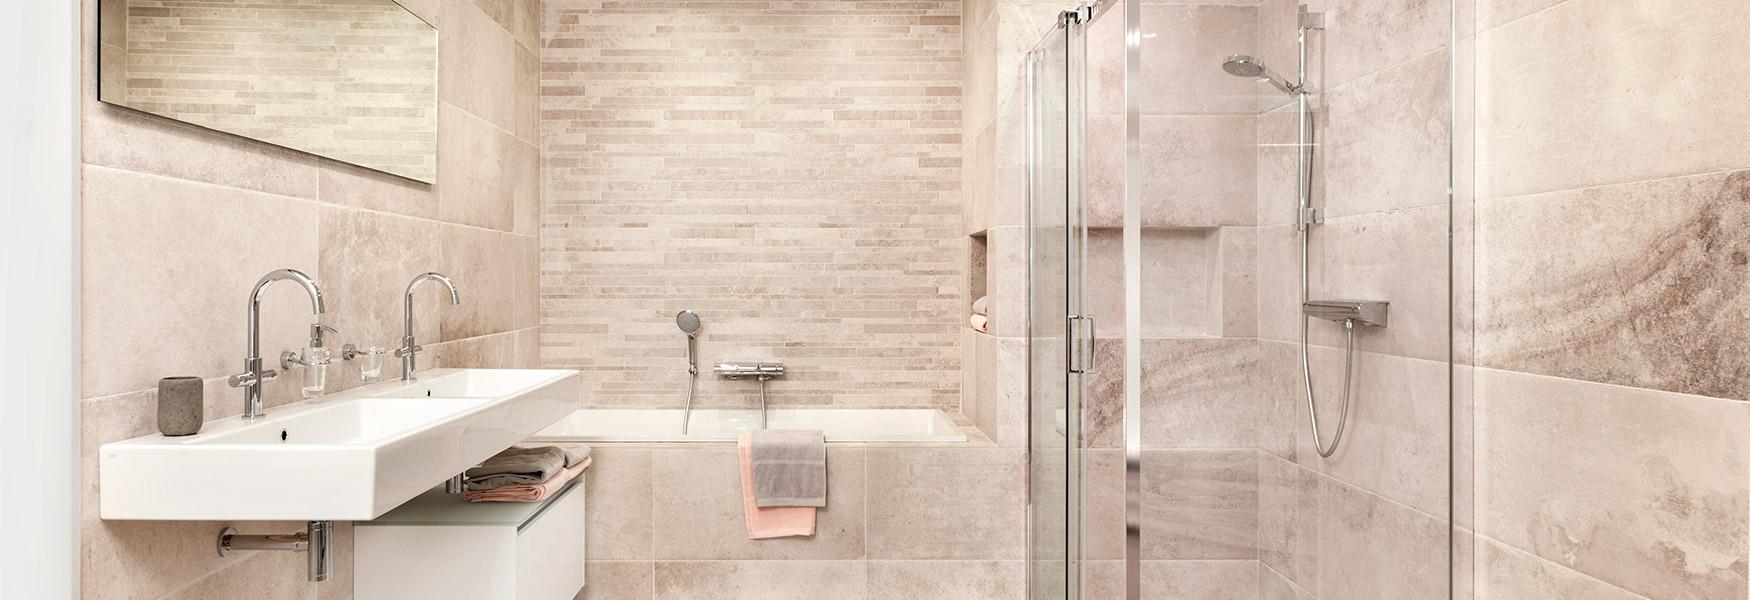 rodiano badkamer brugman badkamers